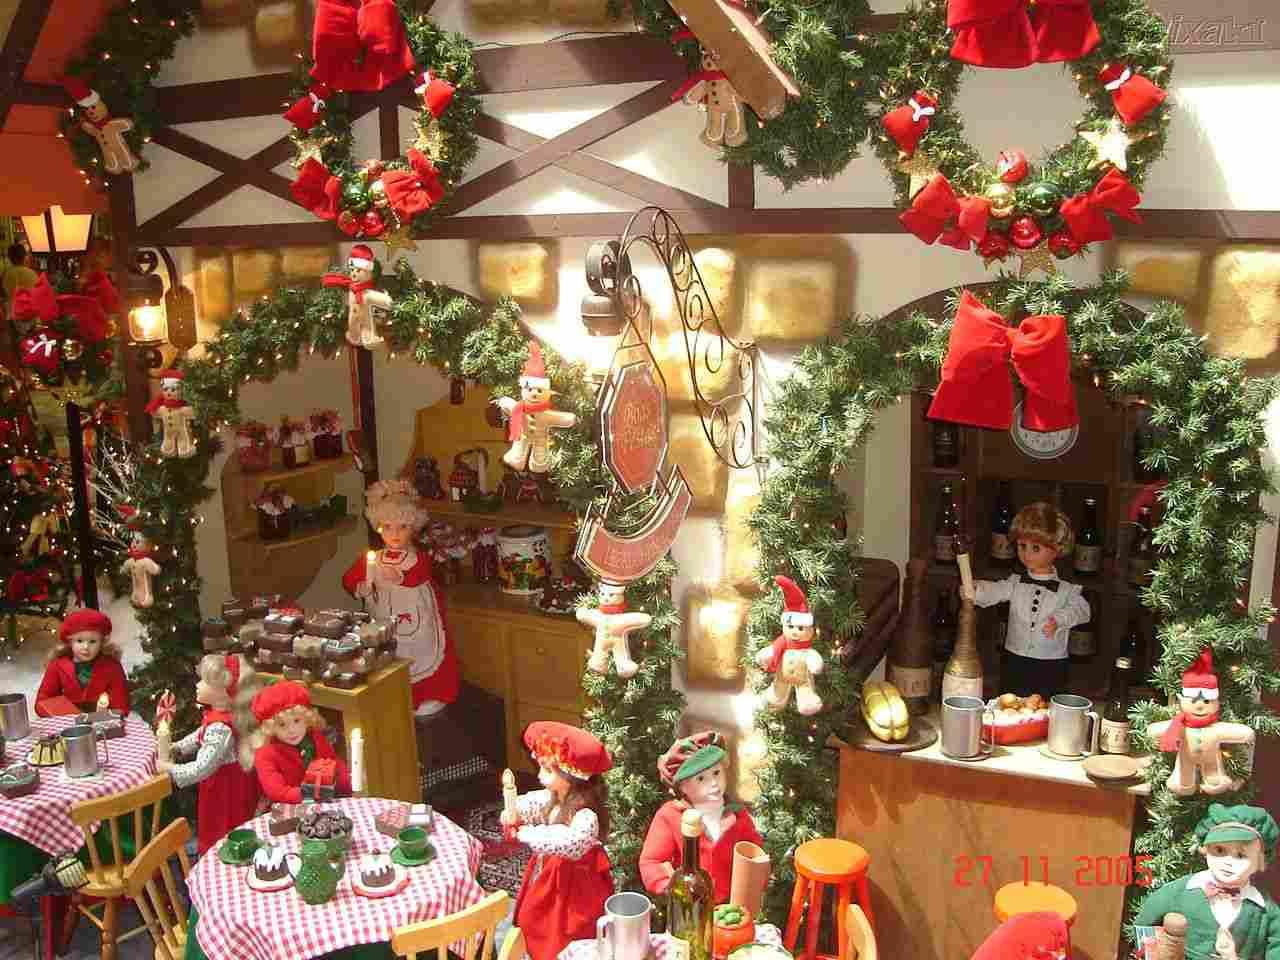 315730 decoracao Onde comprar artigos decorativos para o Natal